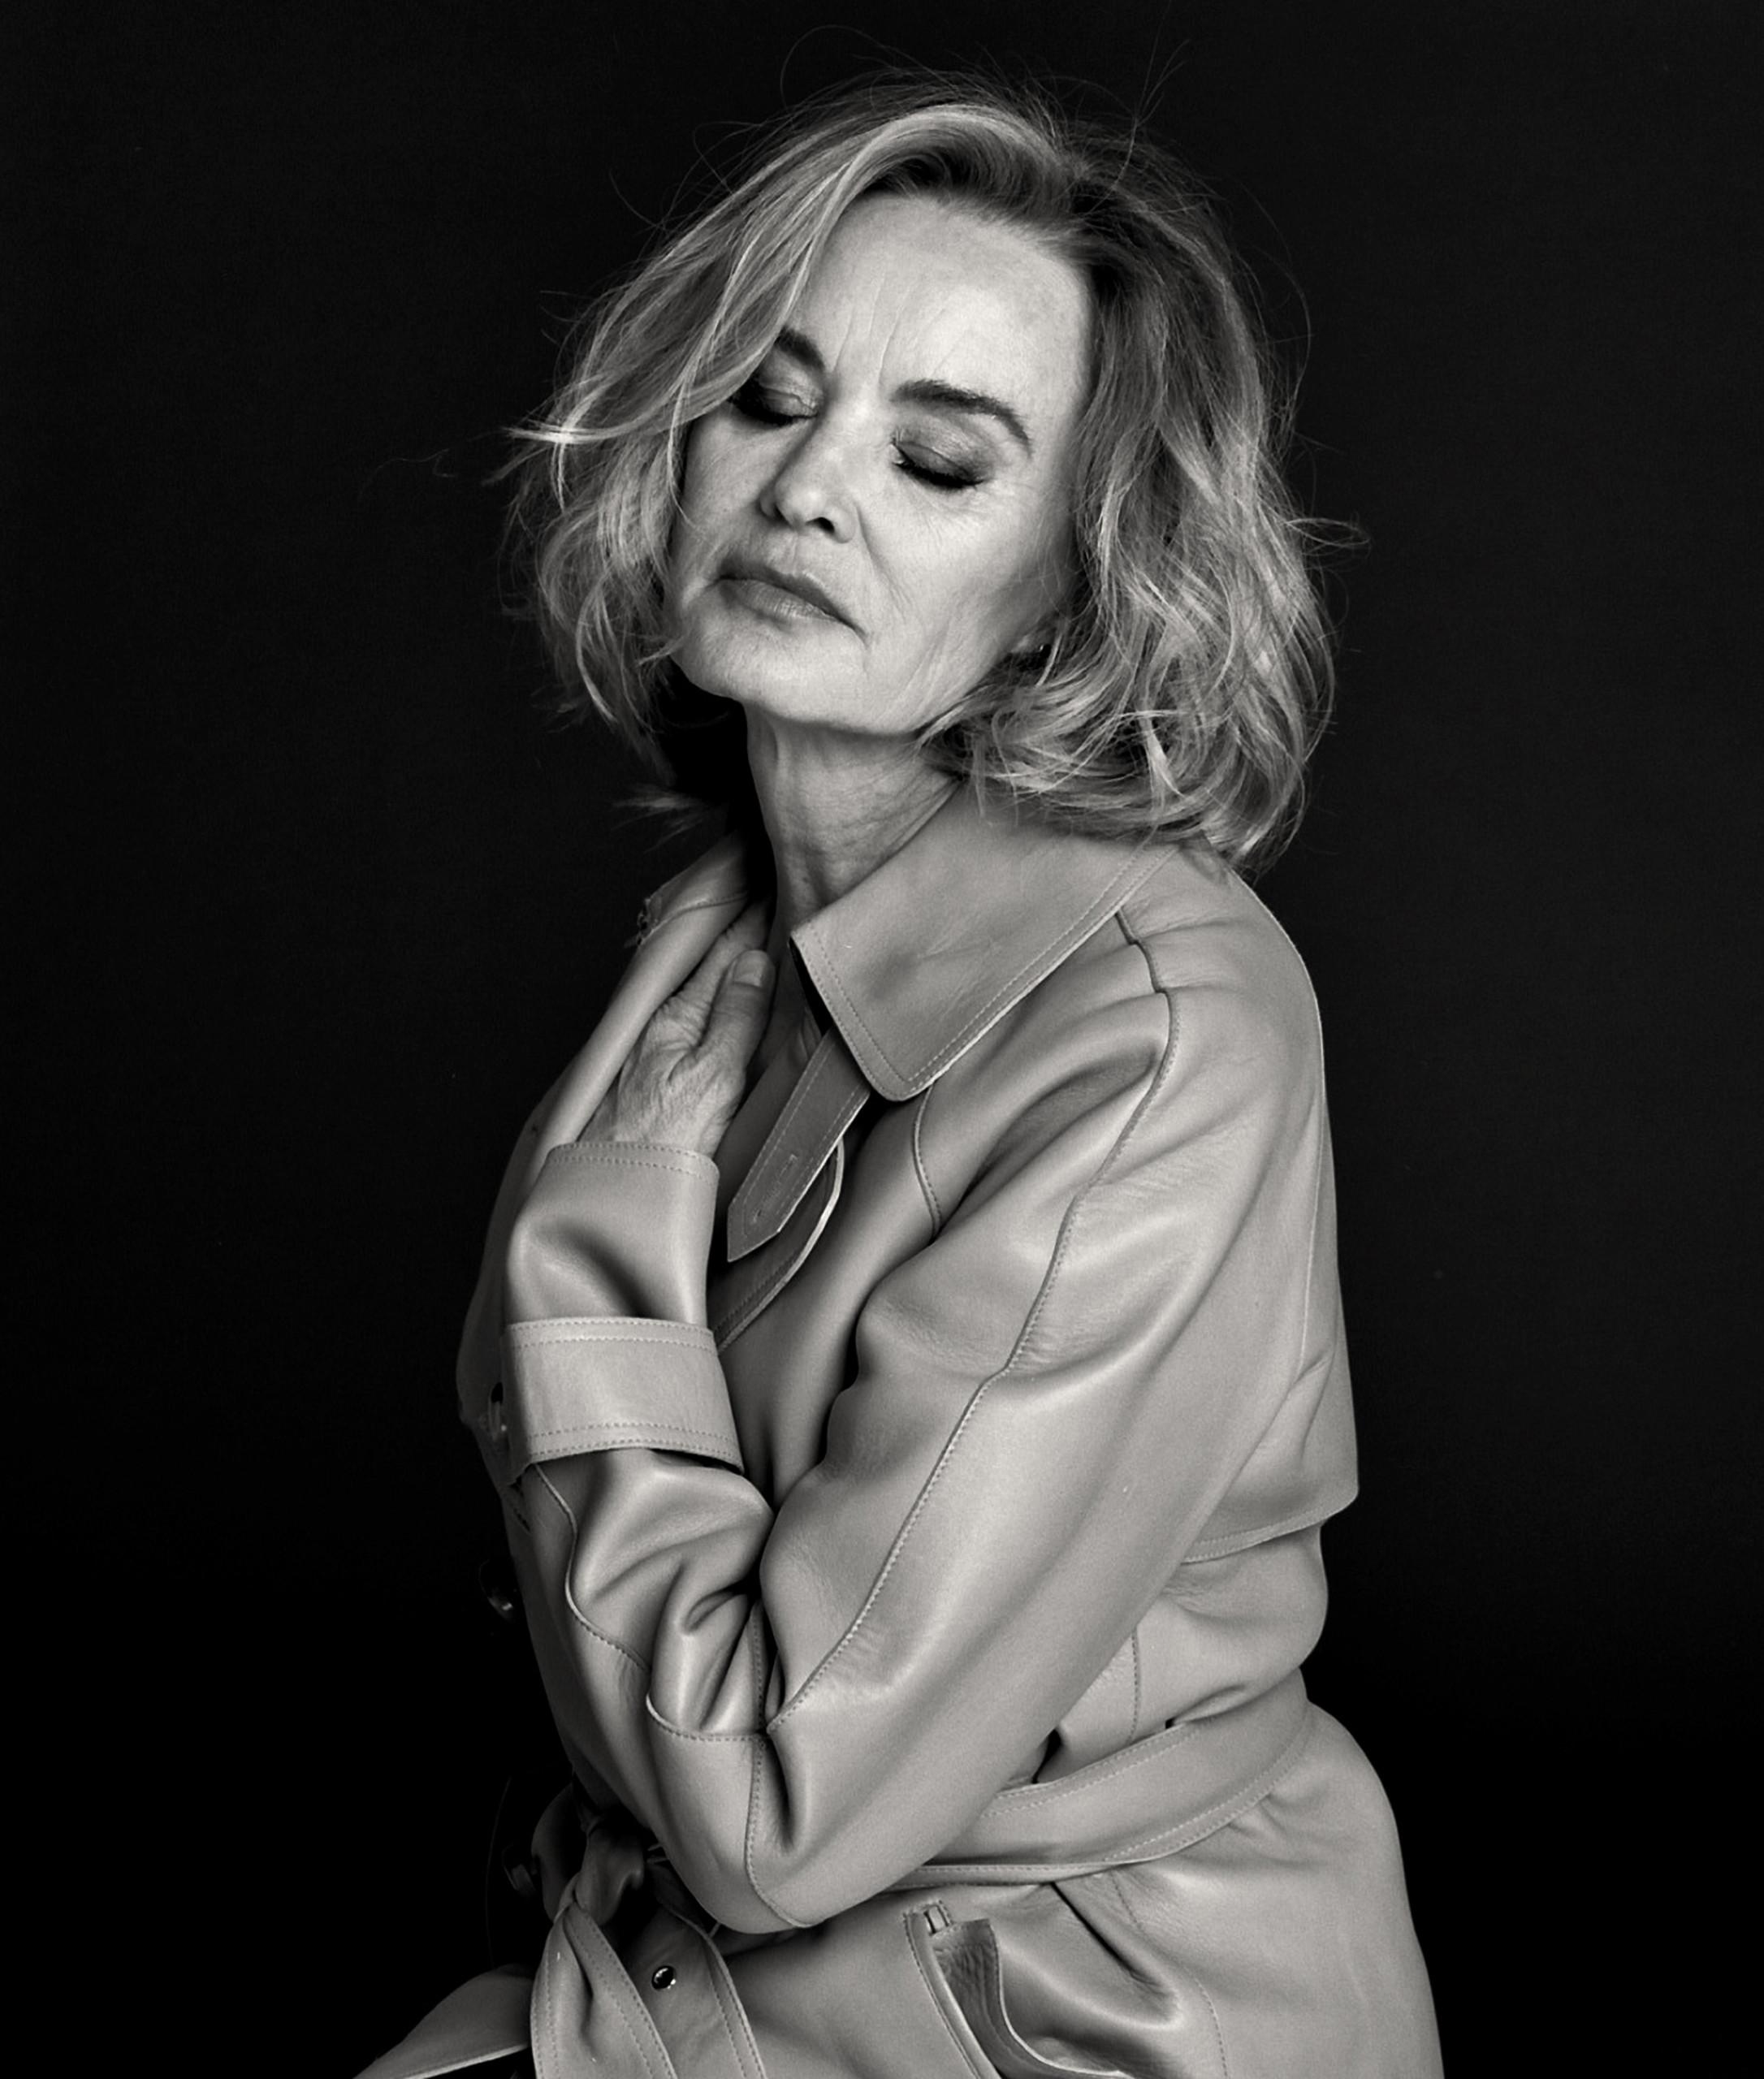 Jessica Lange, Actor